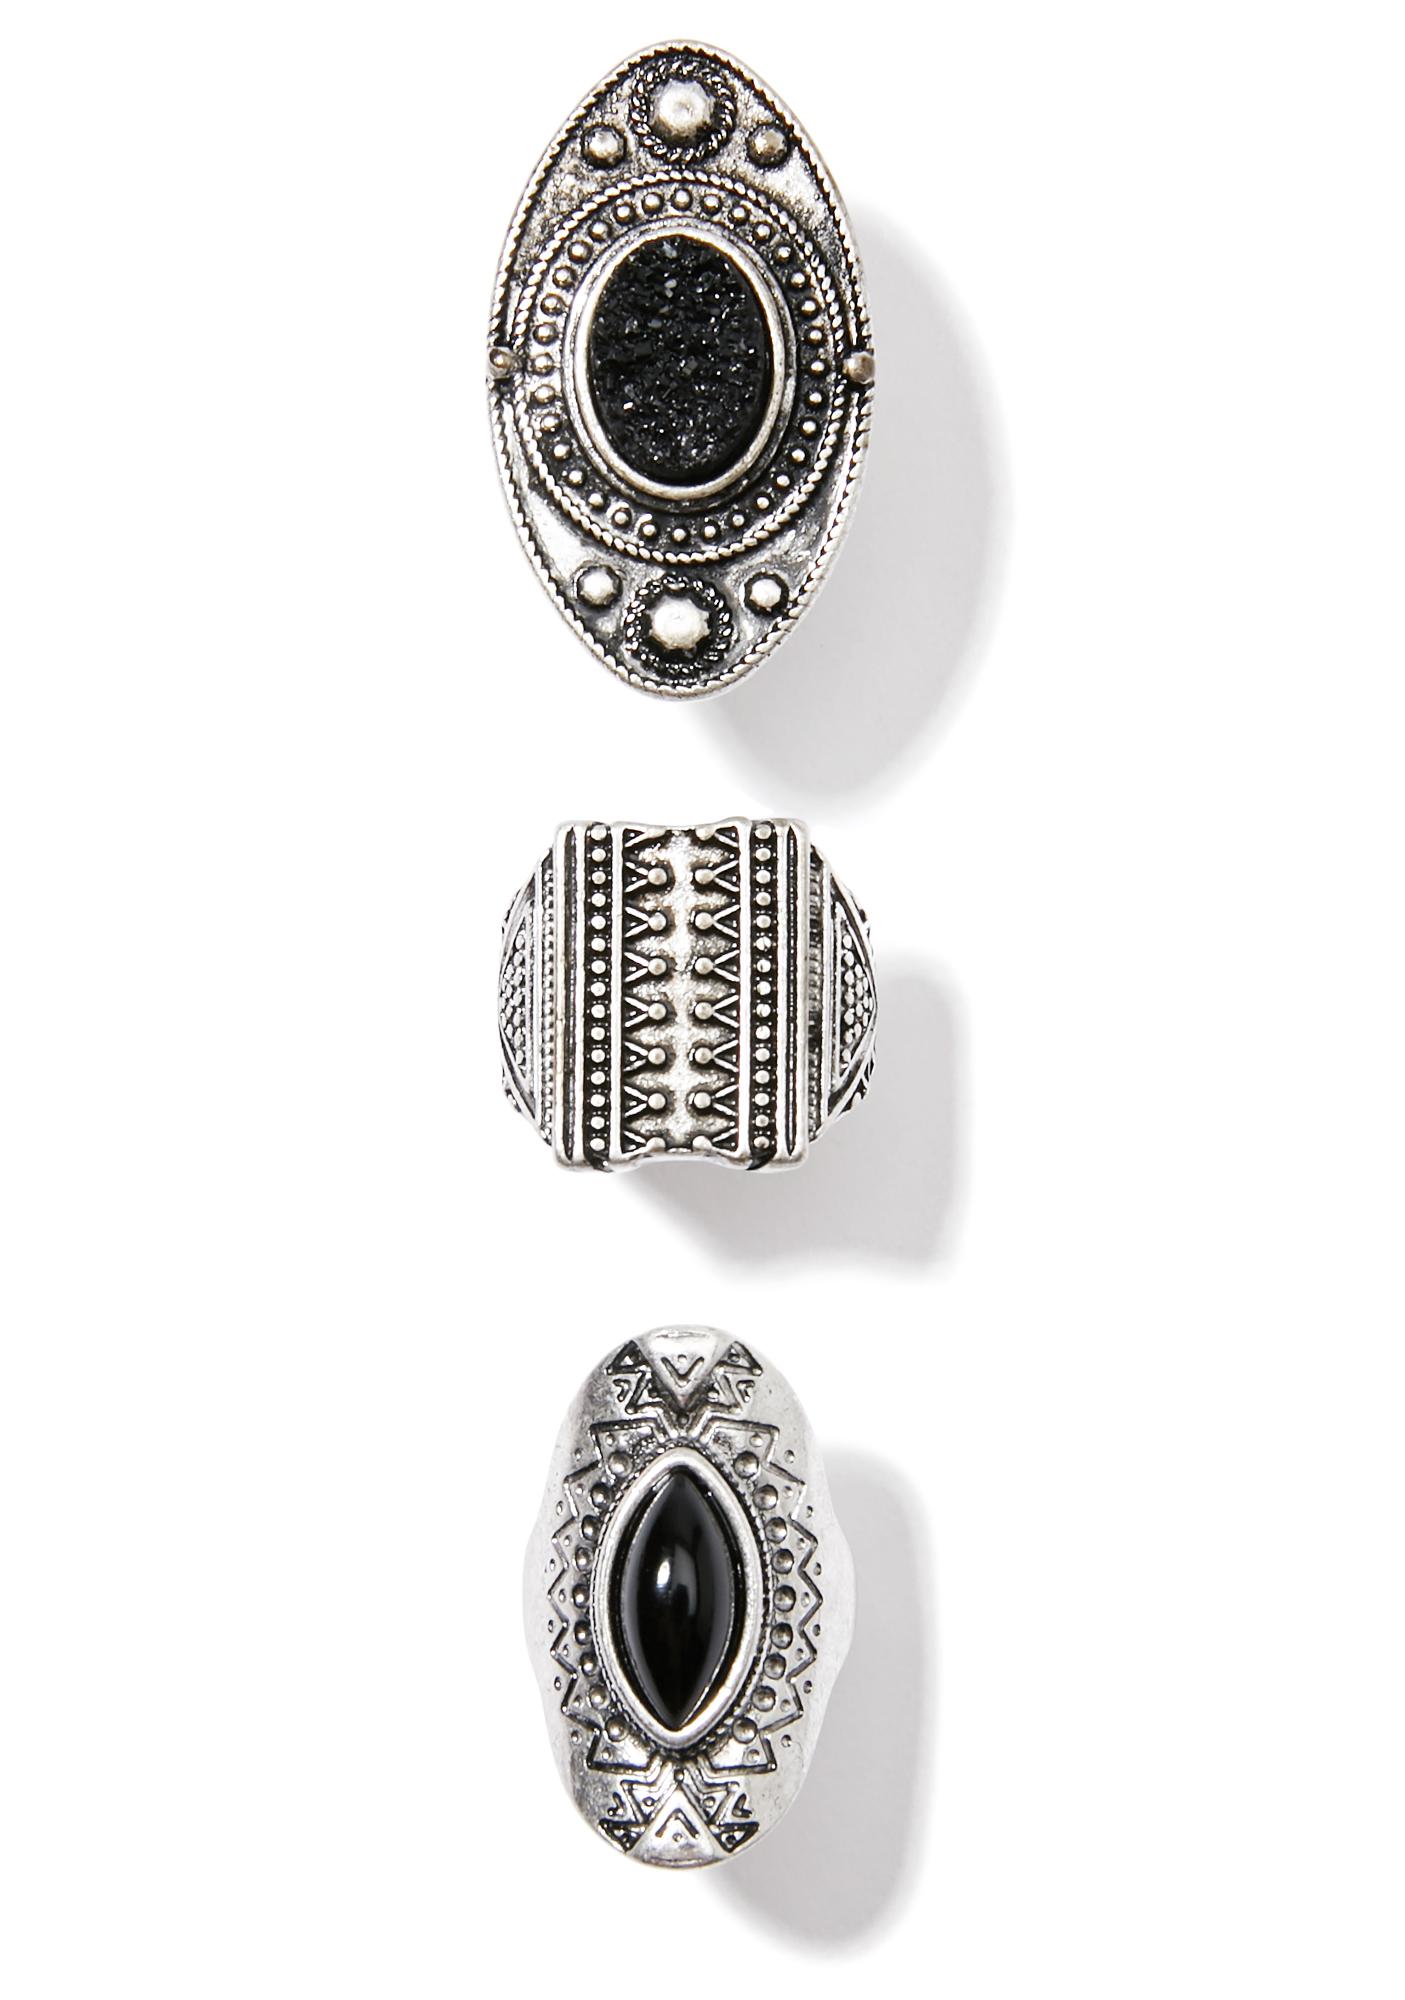 3 Piece Silver Carved Ring Set Gems Black